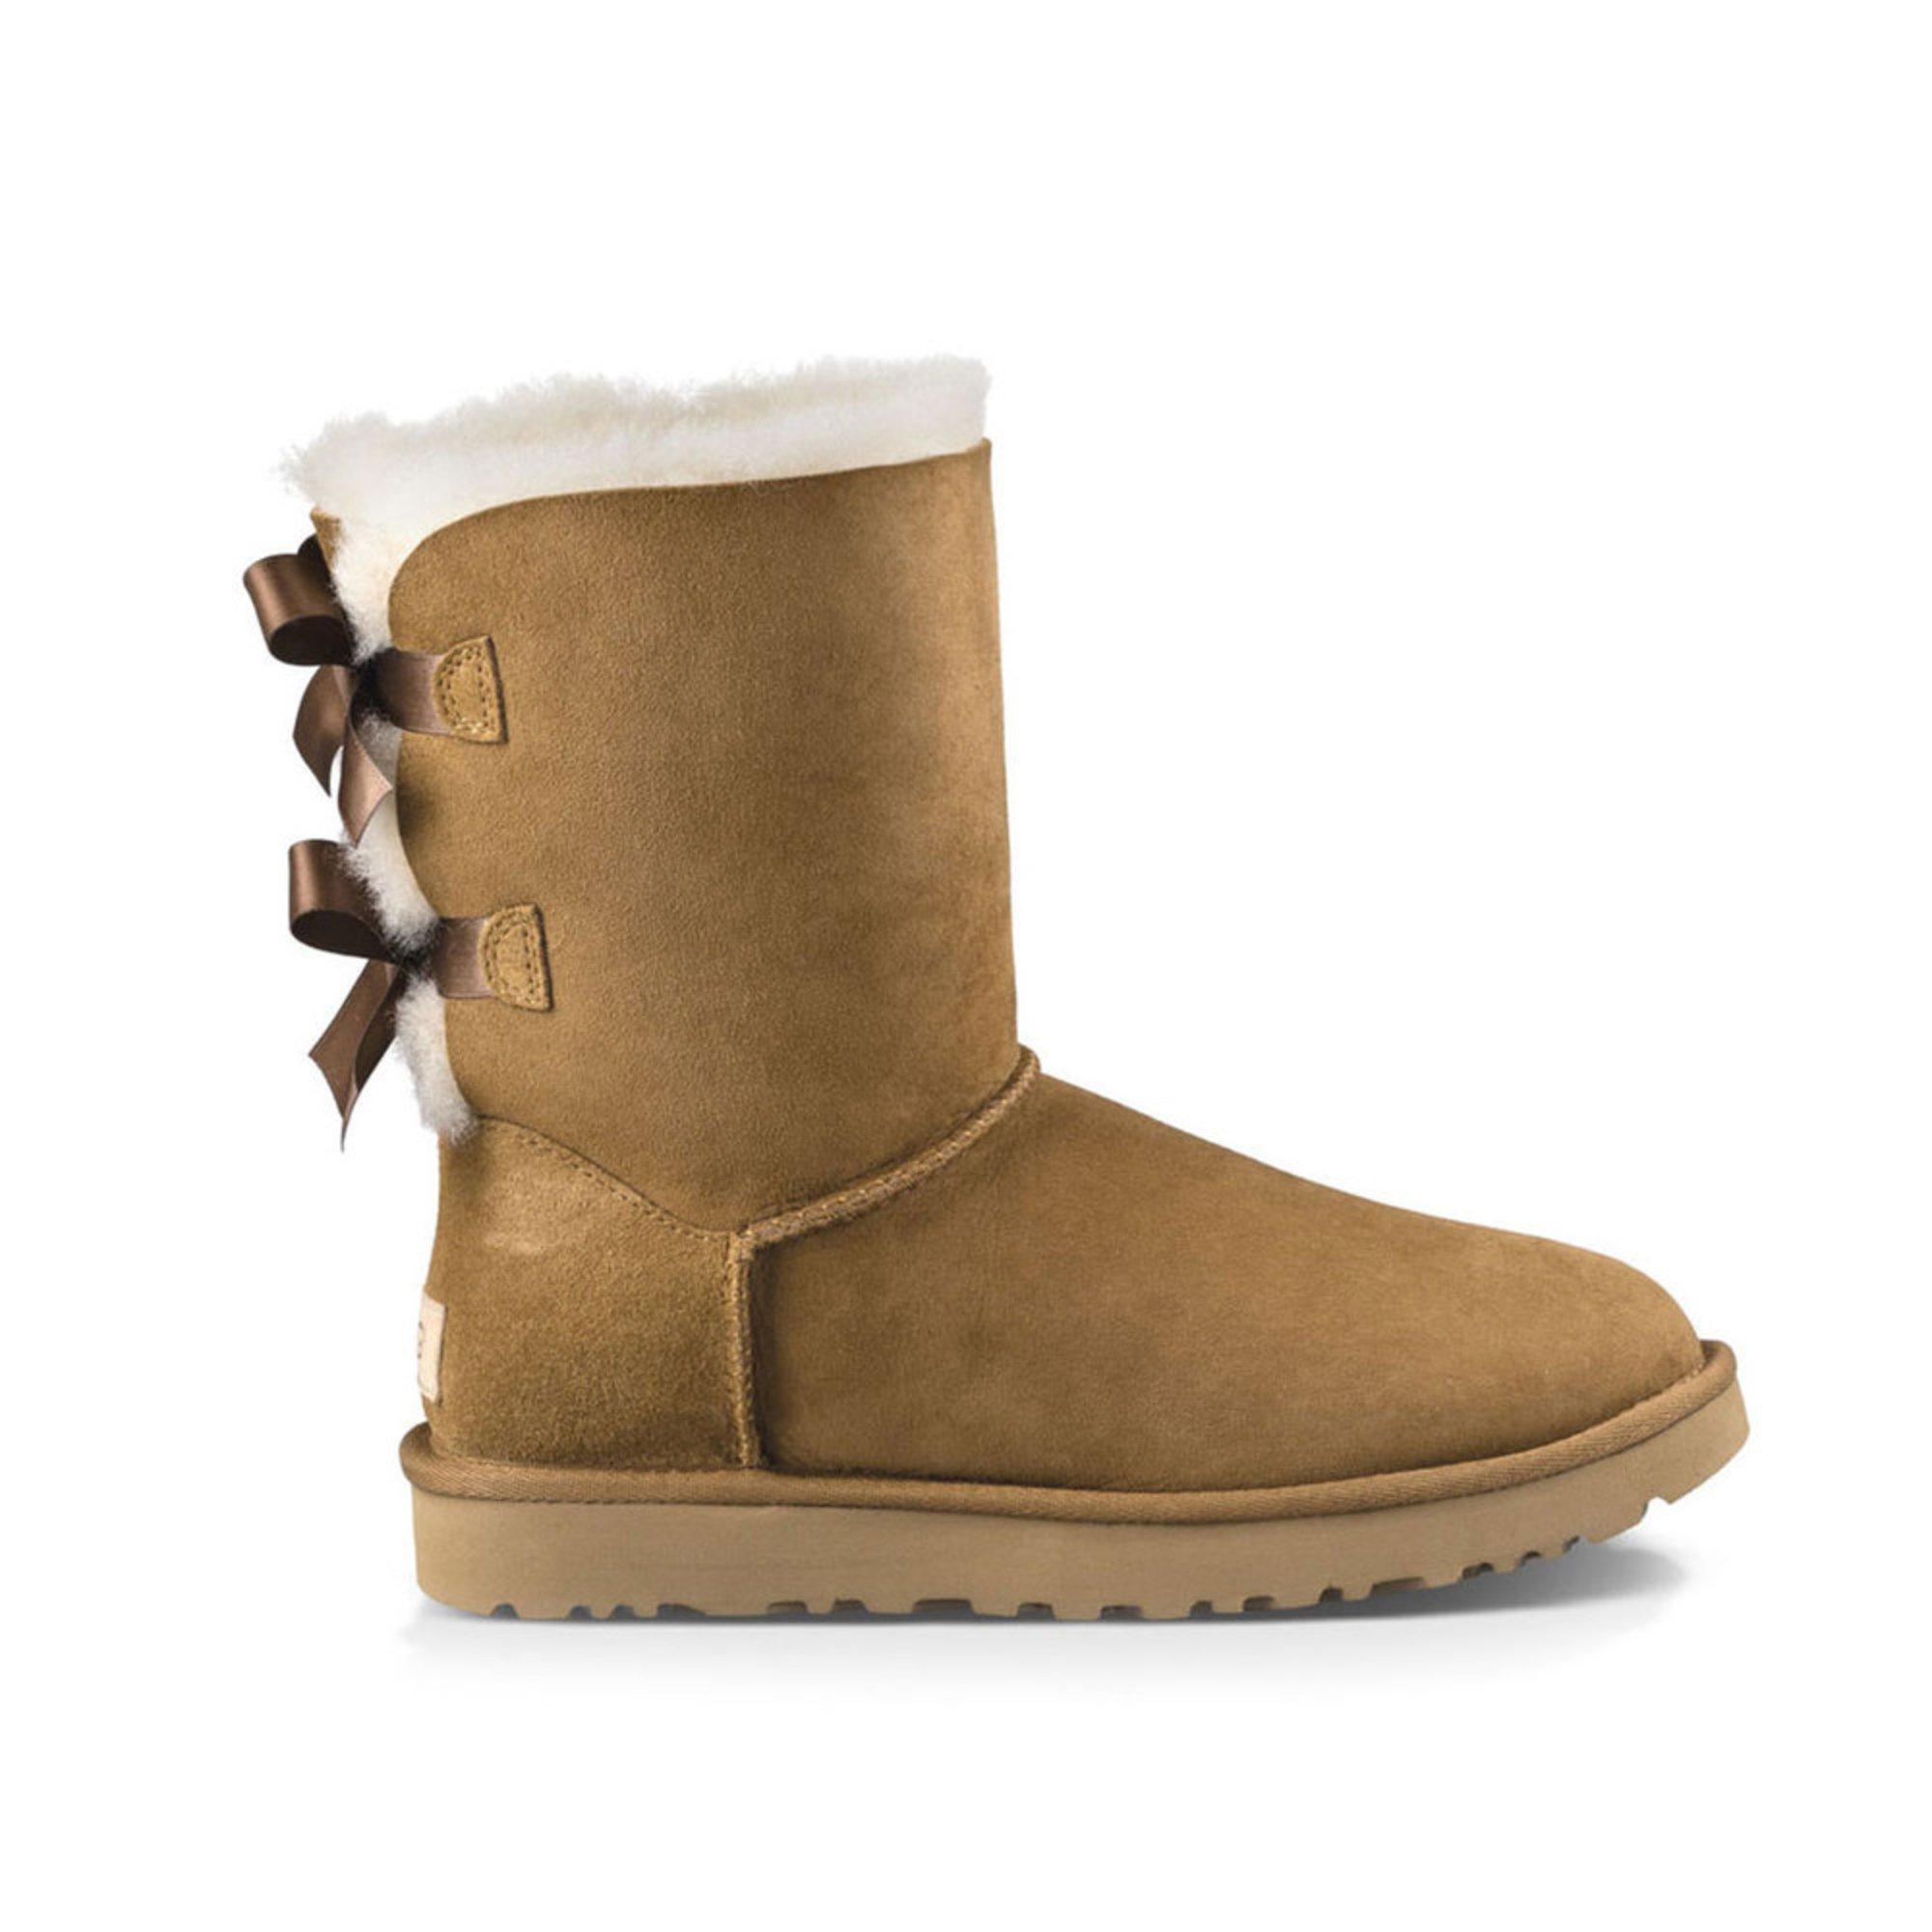 Ugg Women's Bailey Bow Ii Boot   Cold